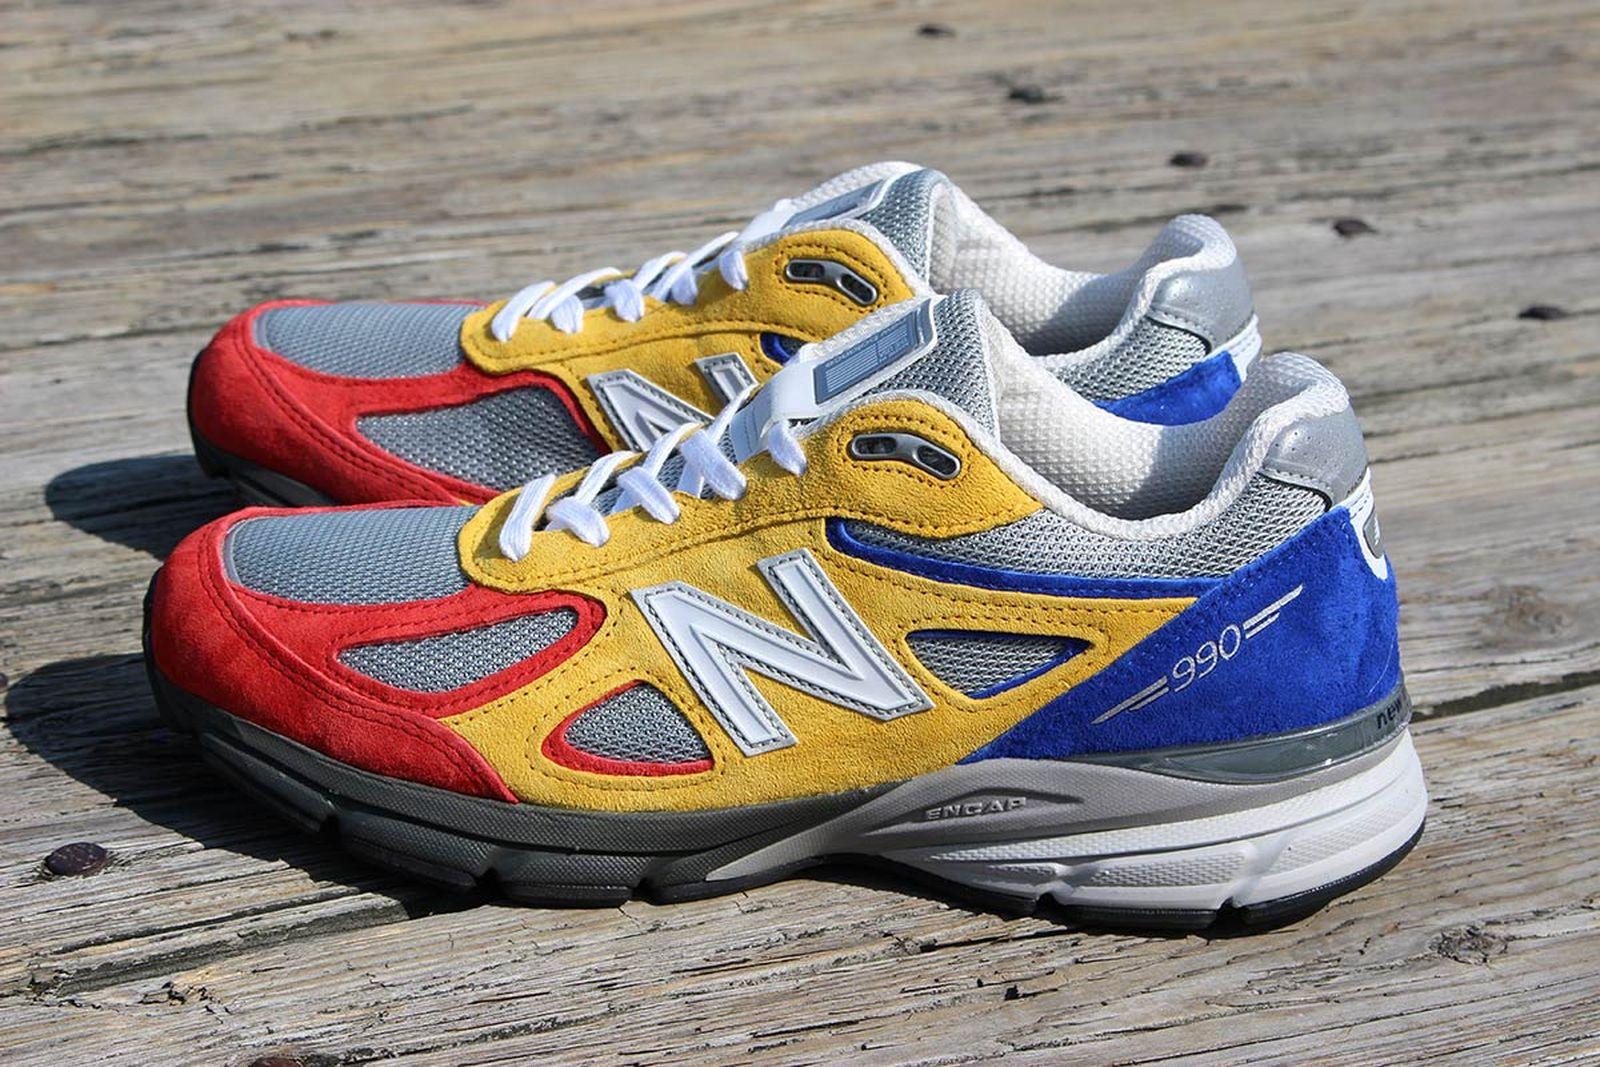 Shoe City & EAT x New Balance 990v4: Official Release Info